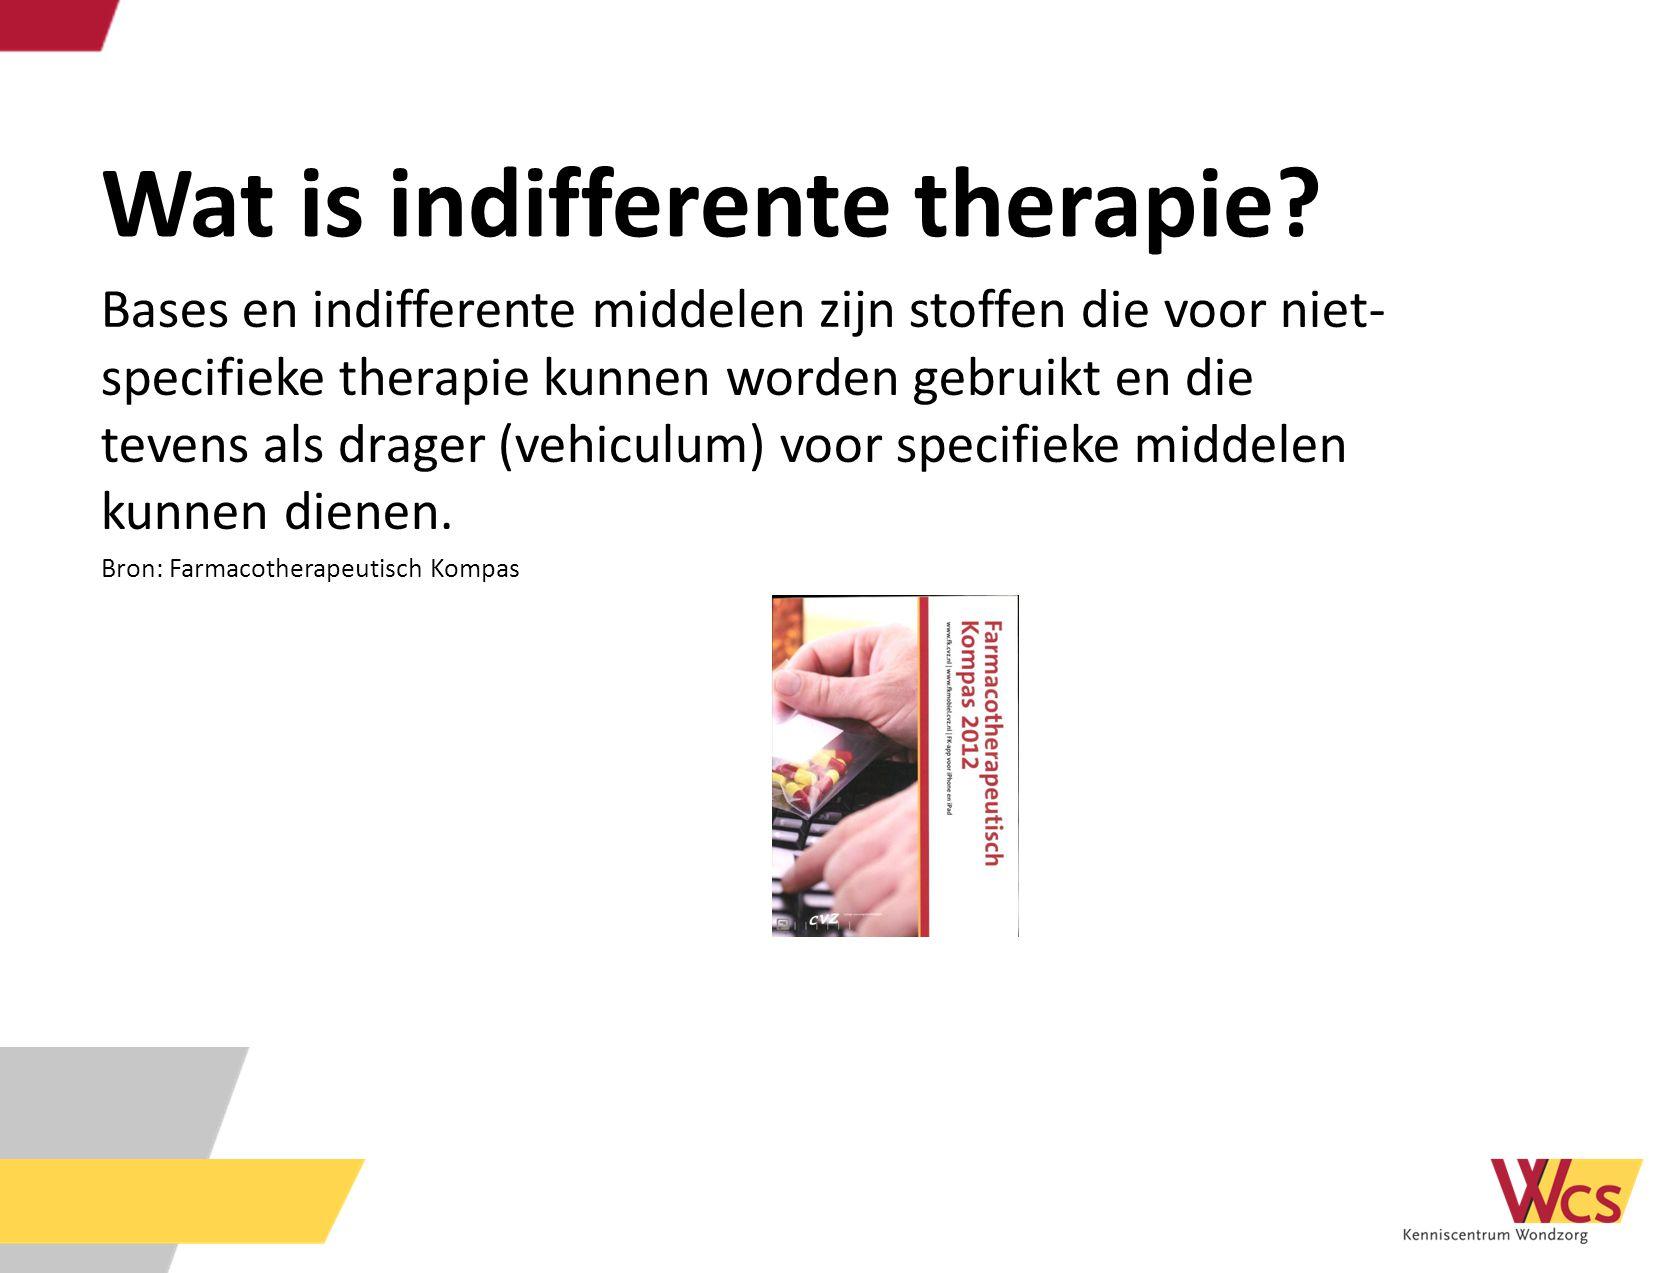 Wat is indifferente therapie